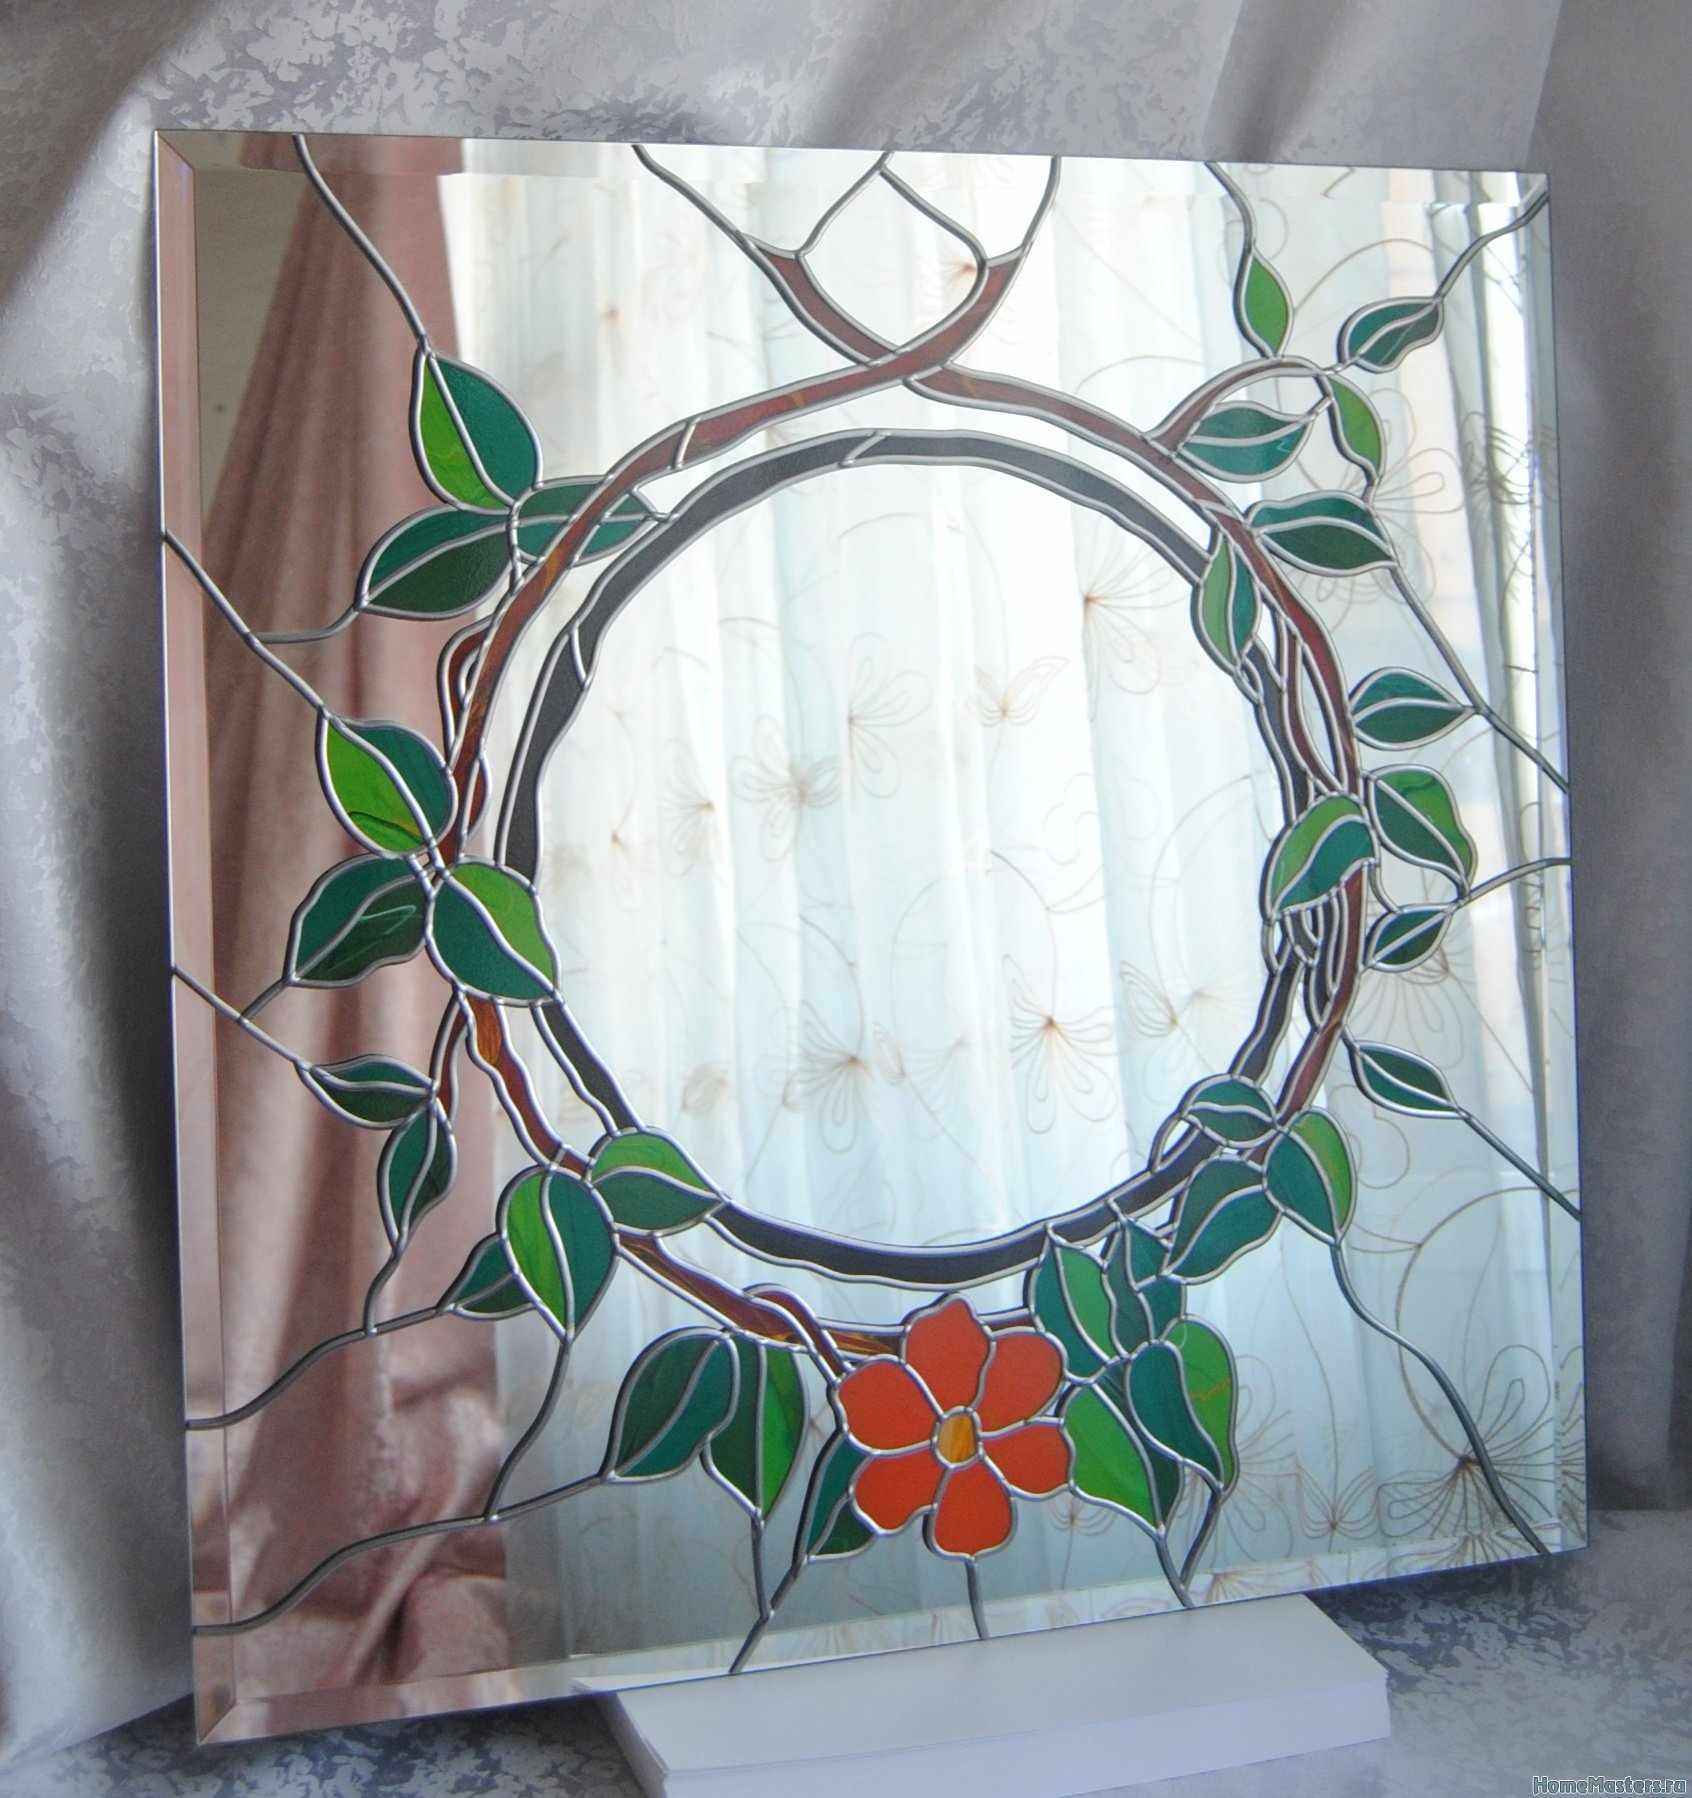 Цветок и листья на стекле